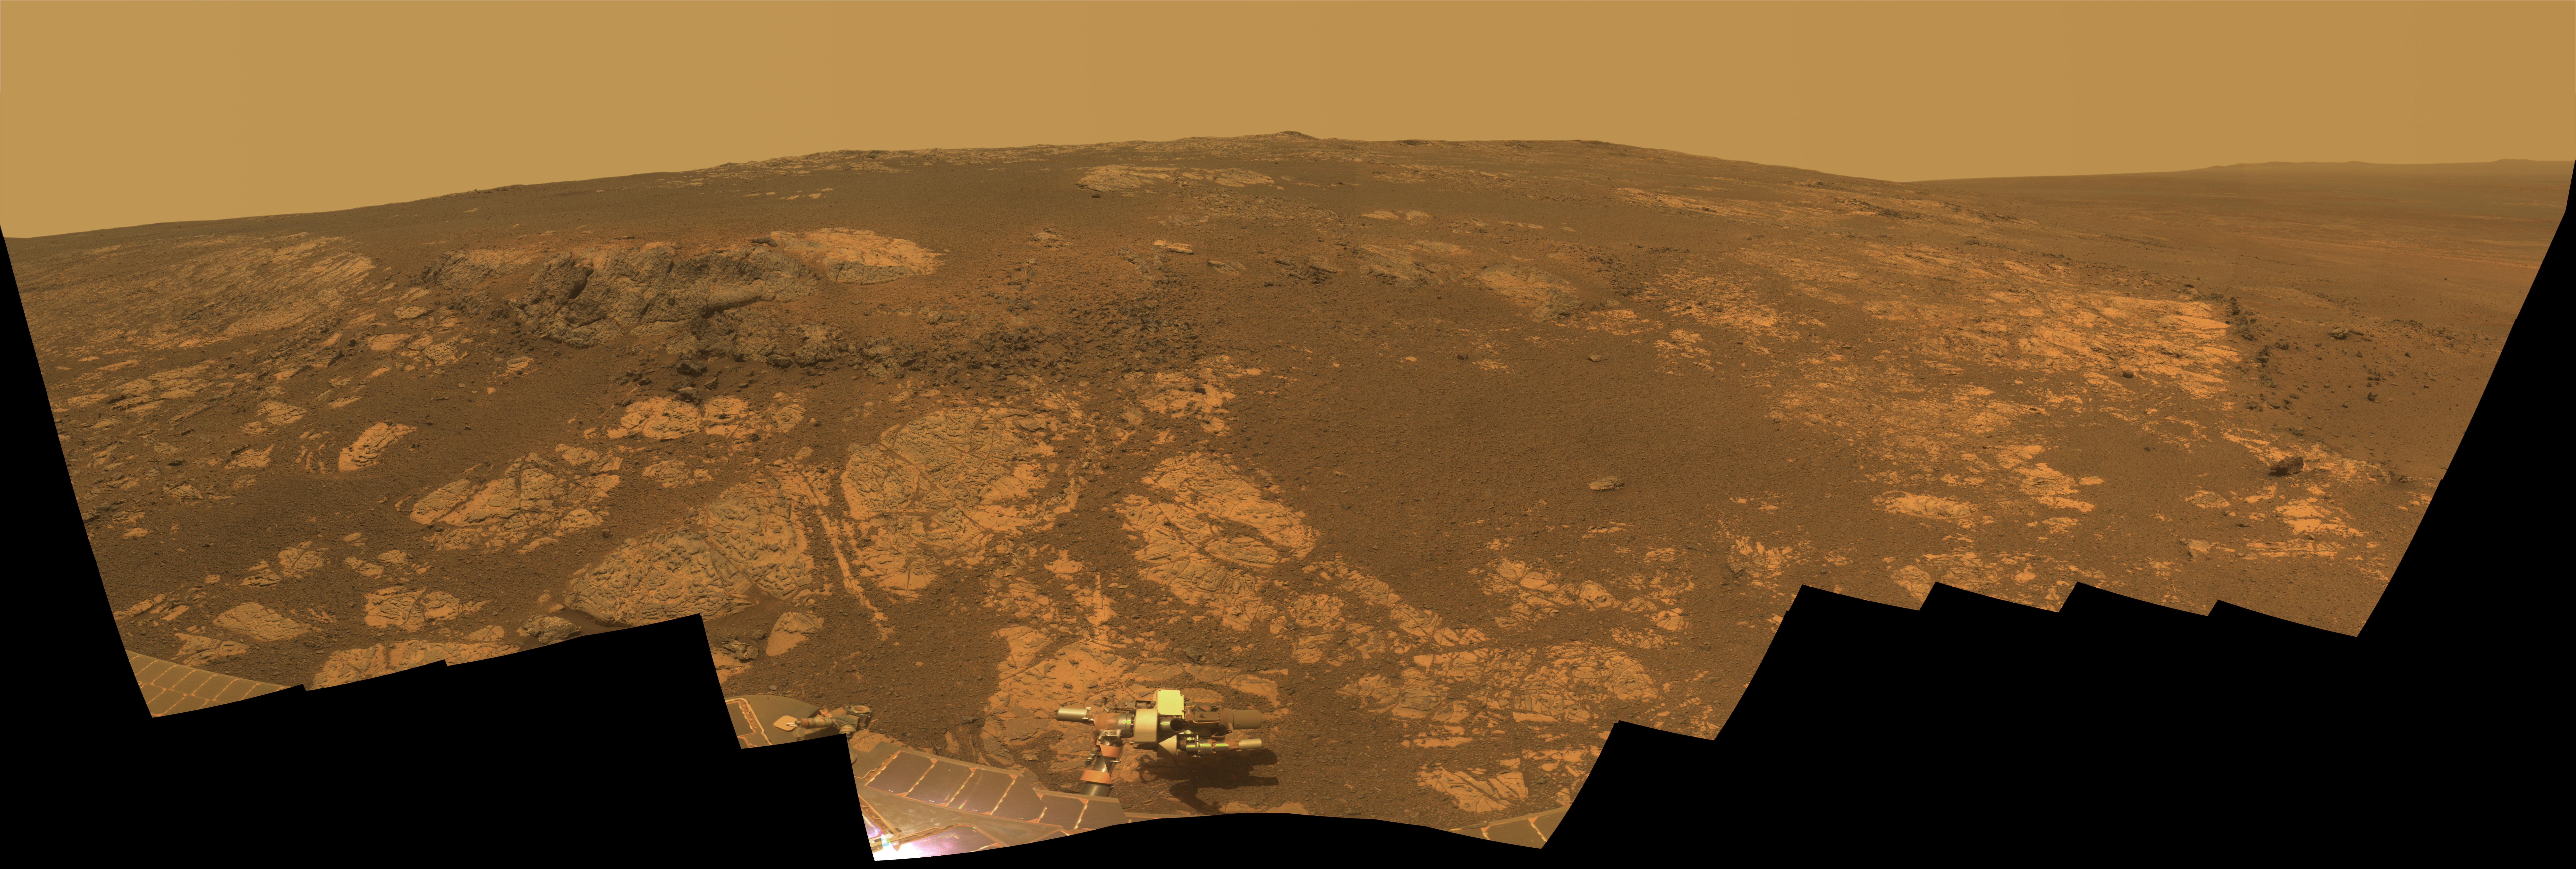 nasa mars landing day - photo #43